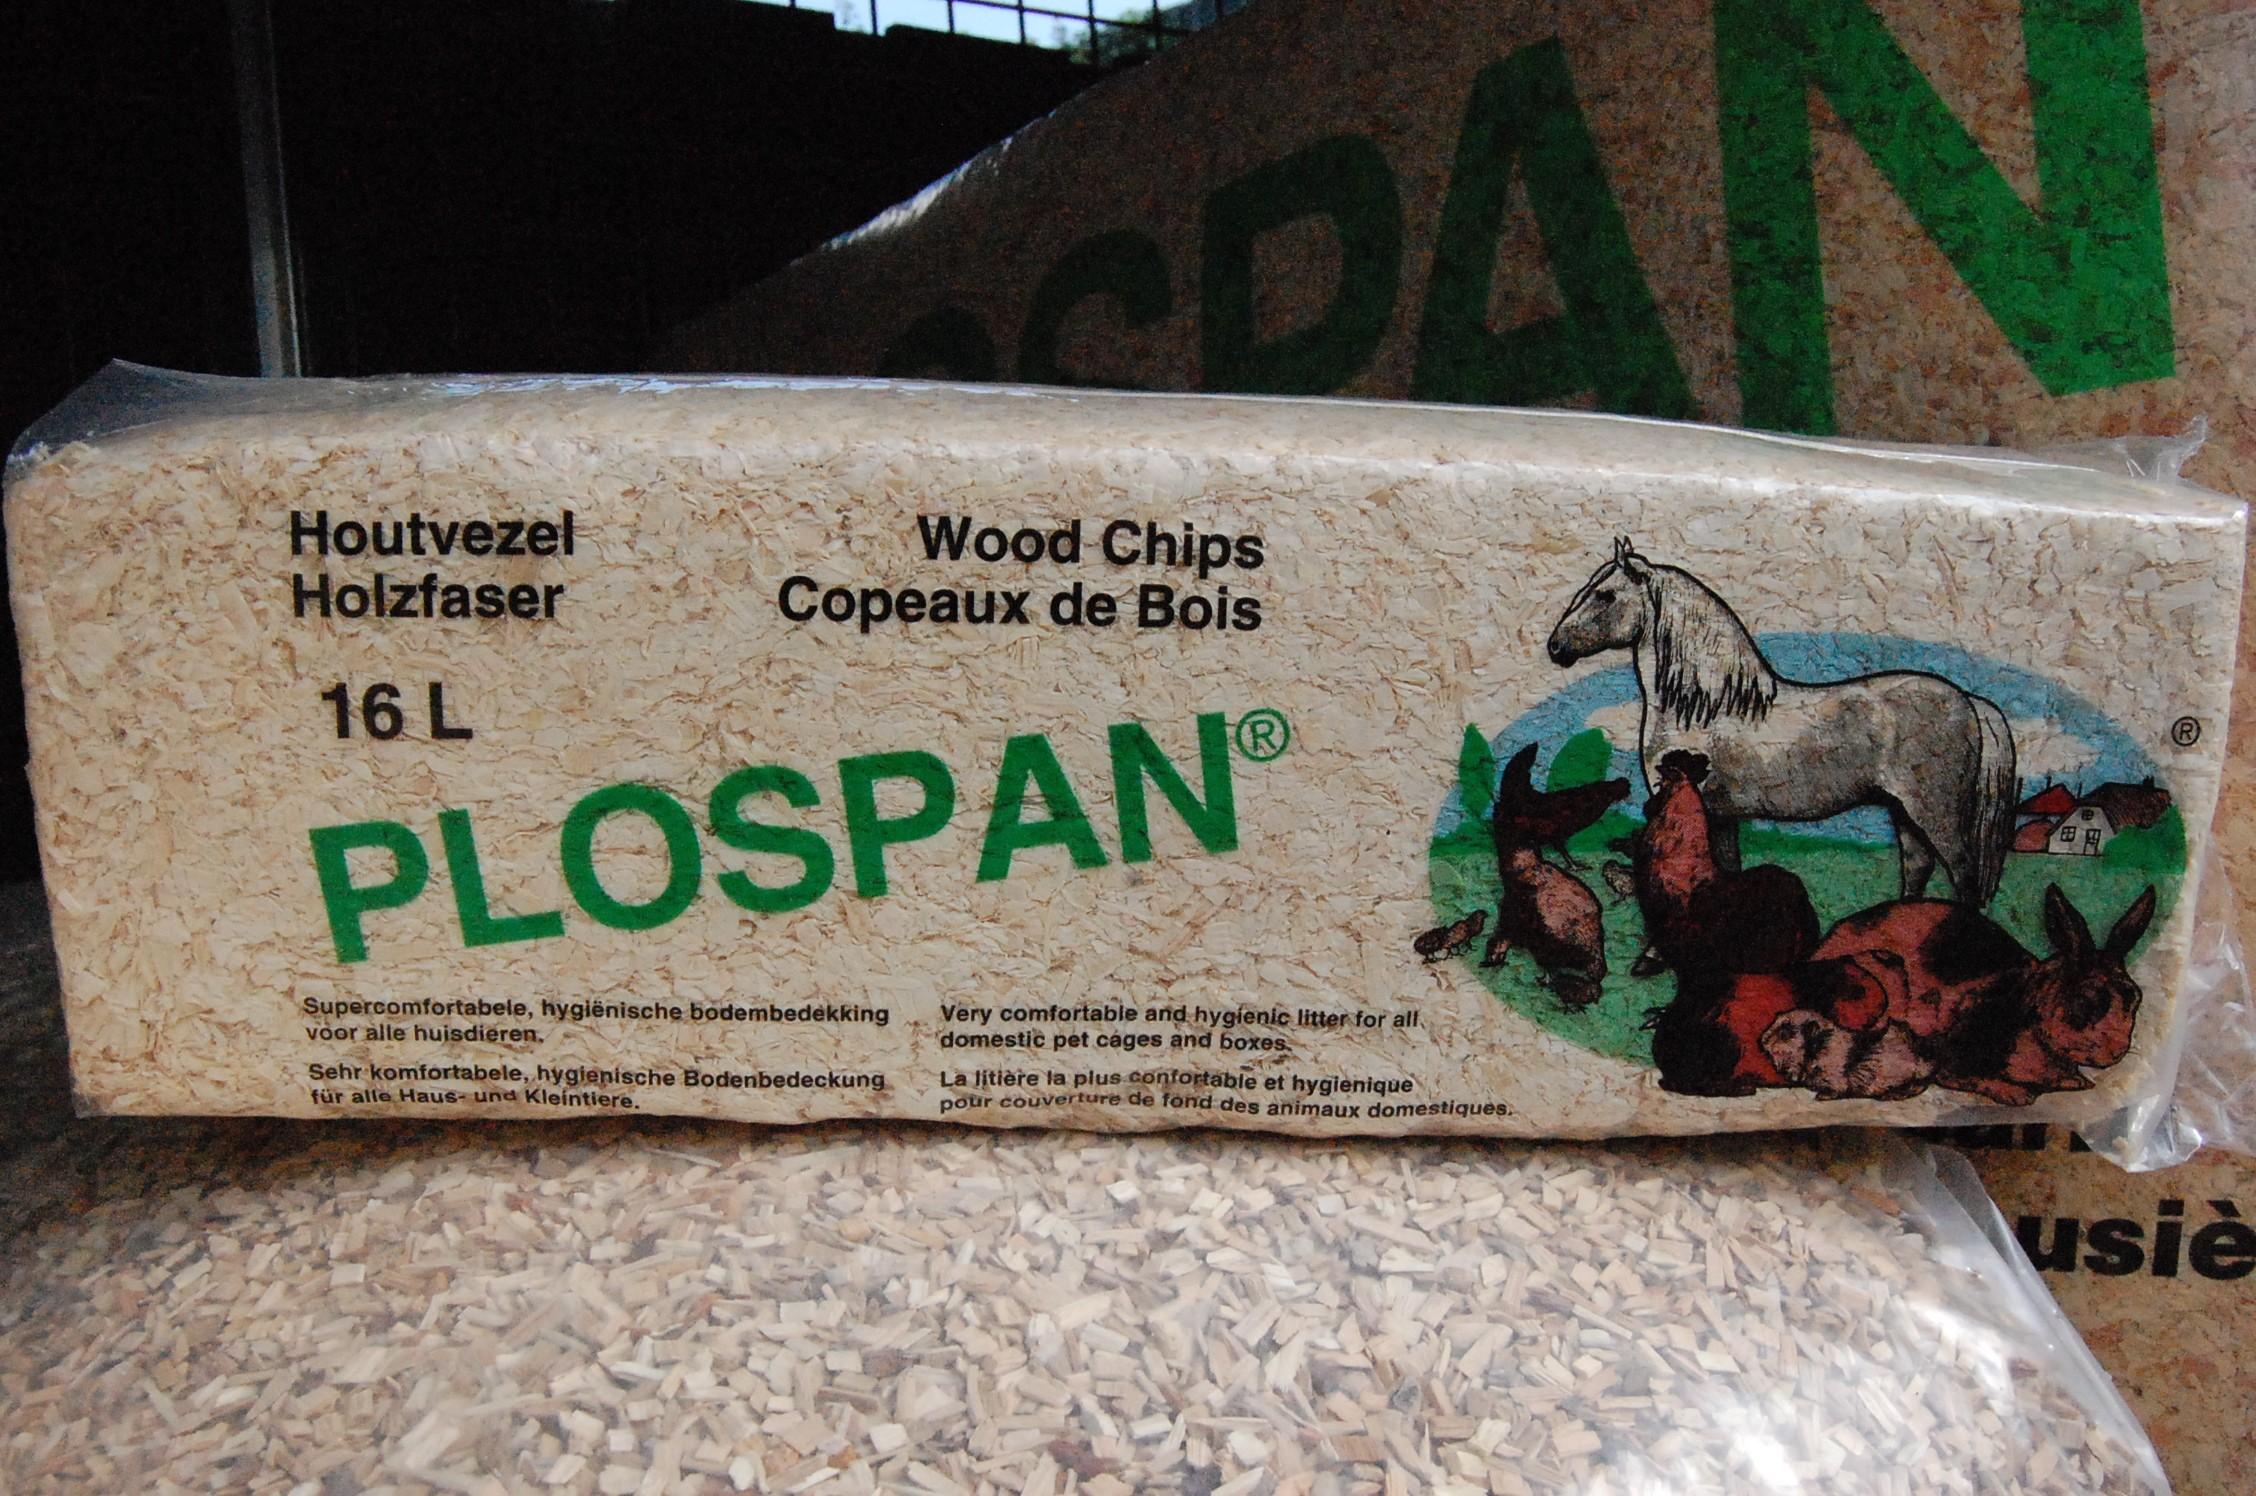 Plospan houtvezel 1 kg